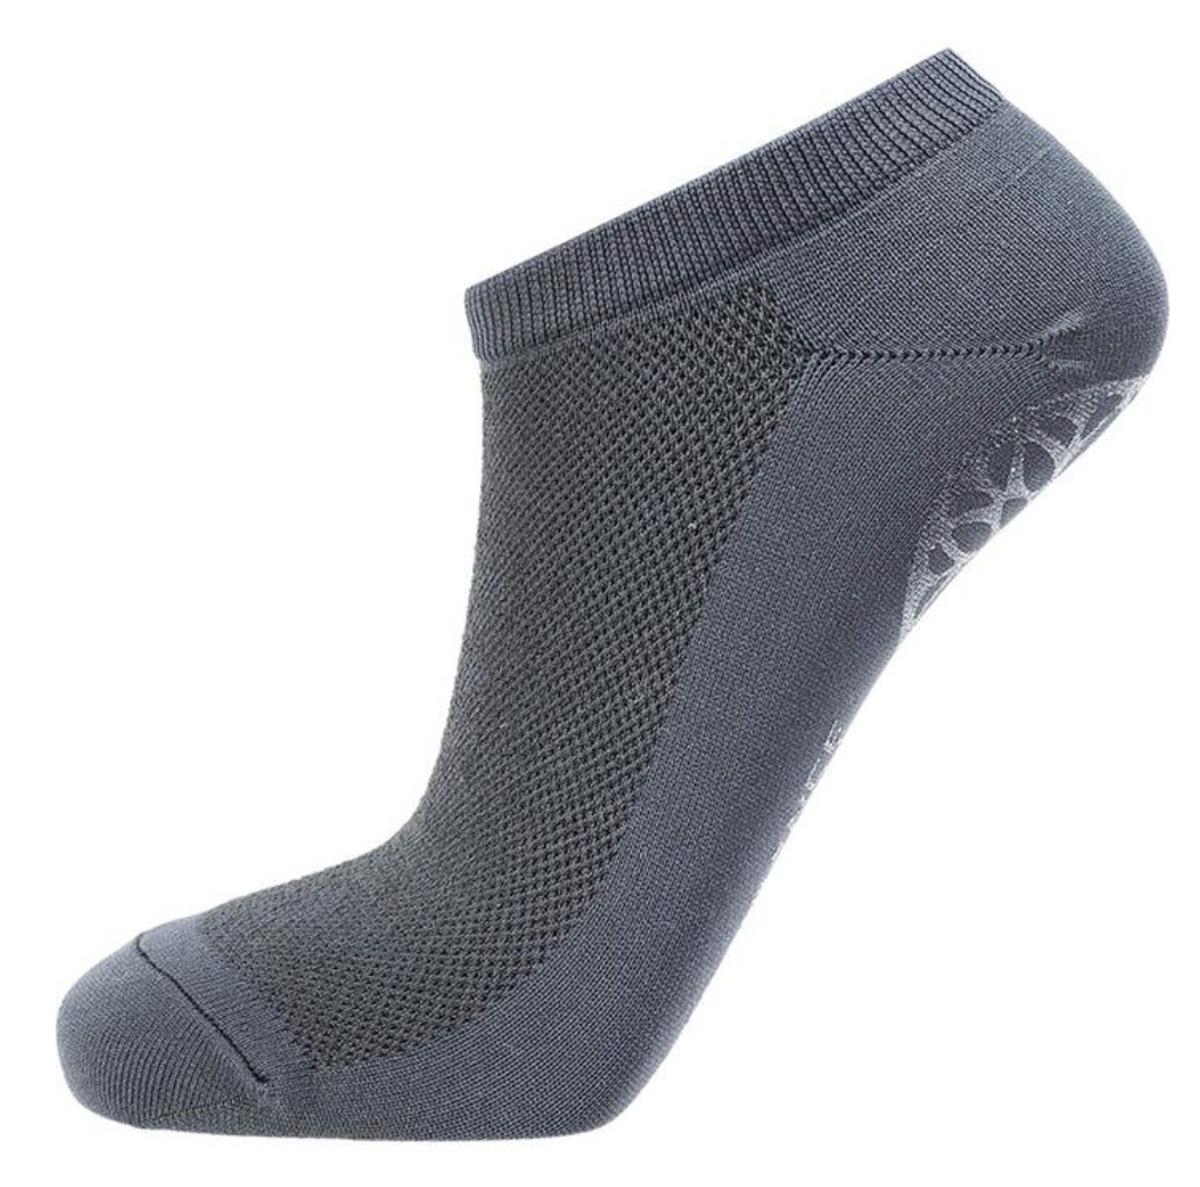 Bilde av Athlecia  Tium Yoga Socks Low Cut EA183920 1001 black